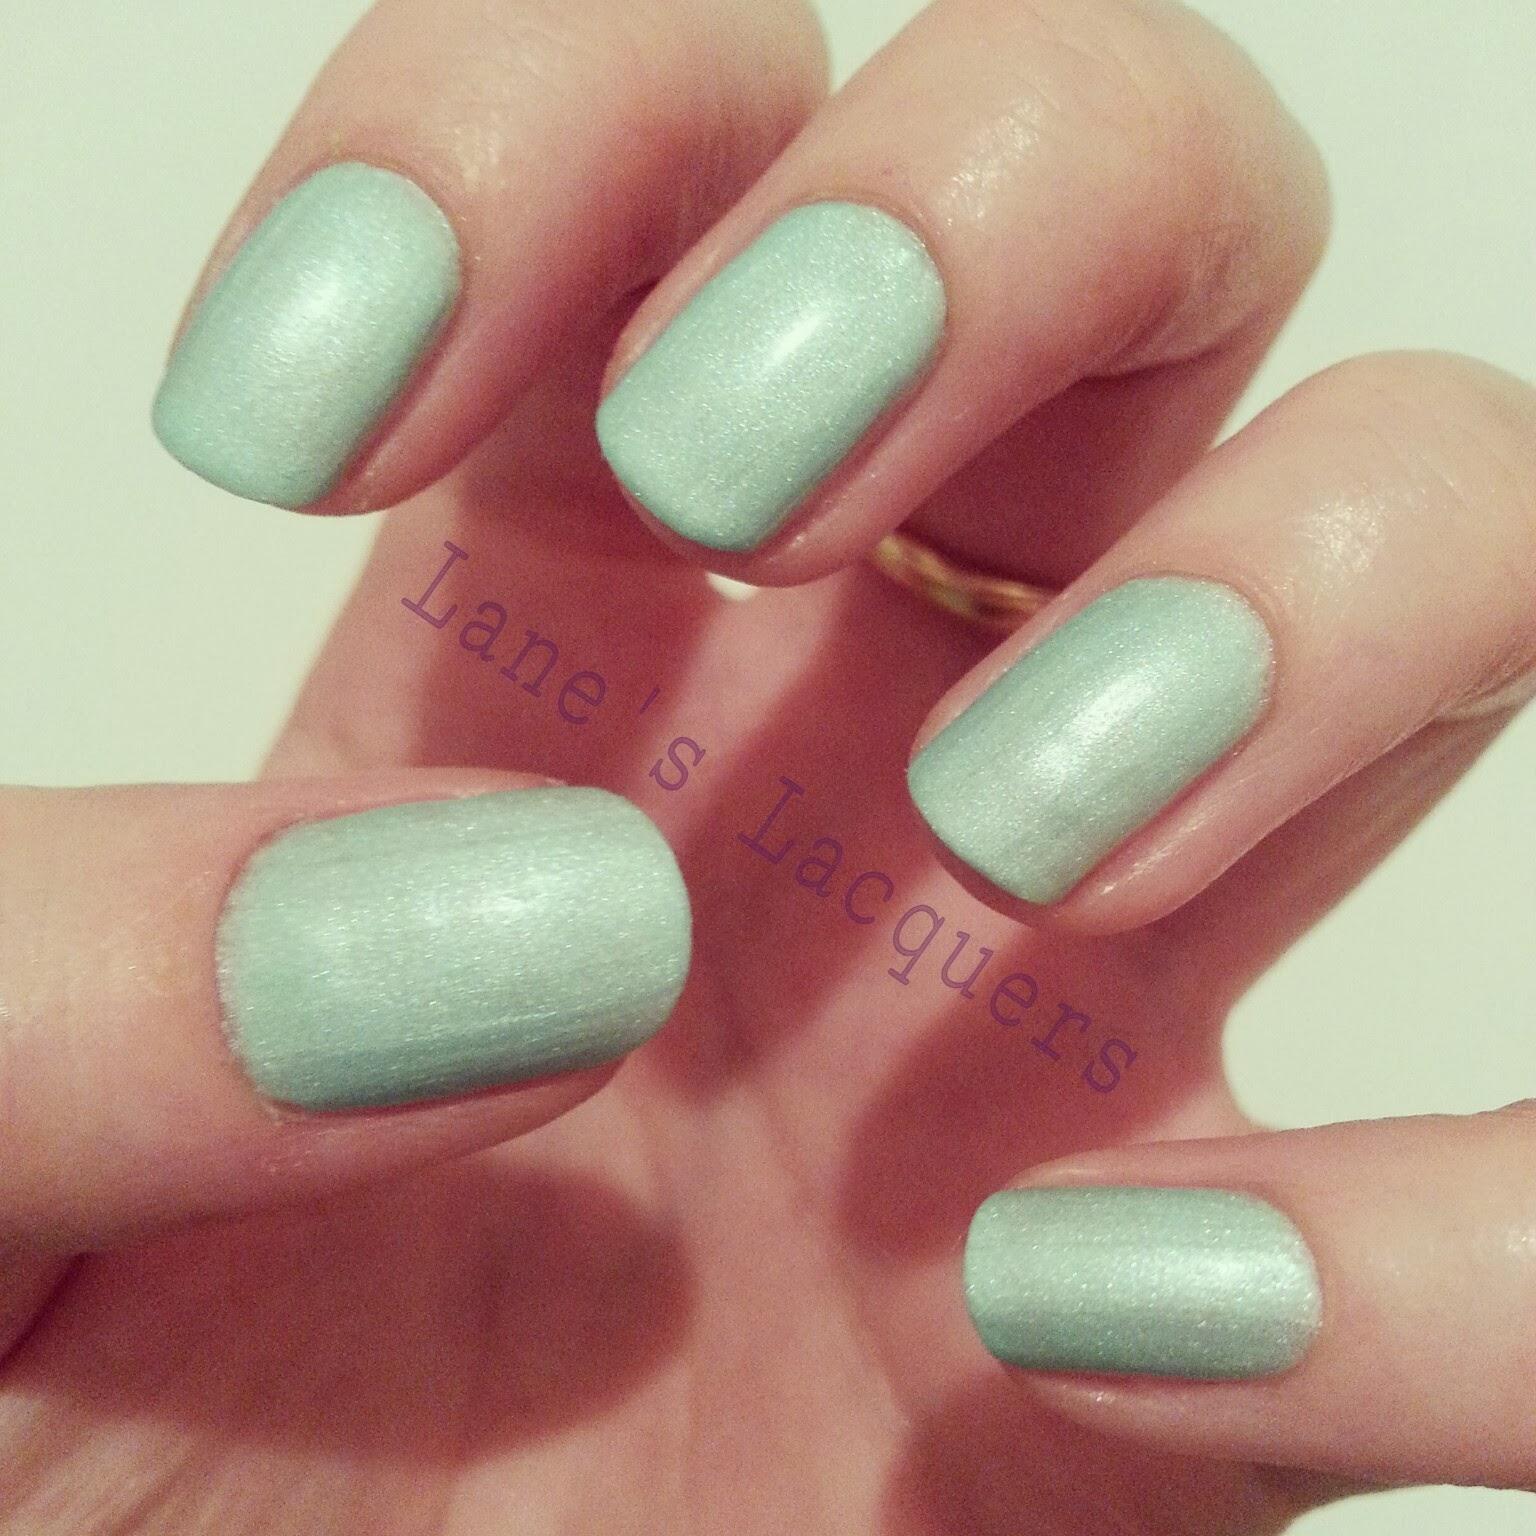 barry-m-silk-meadow-swatch-manicure